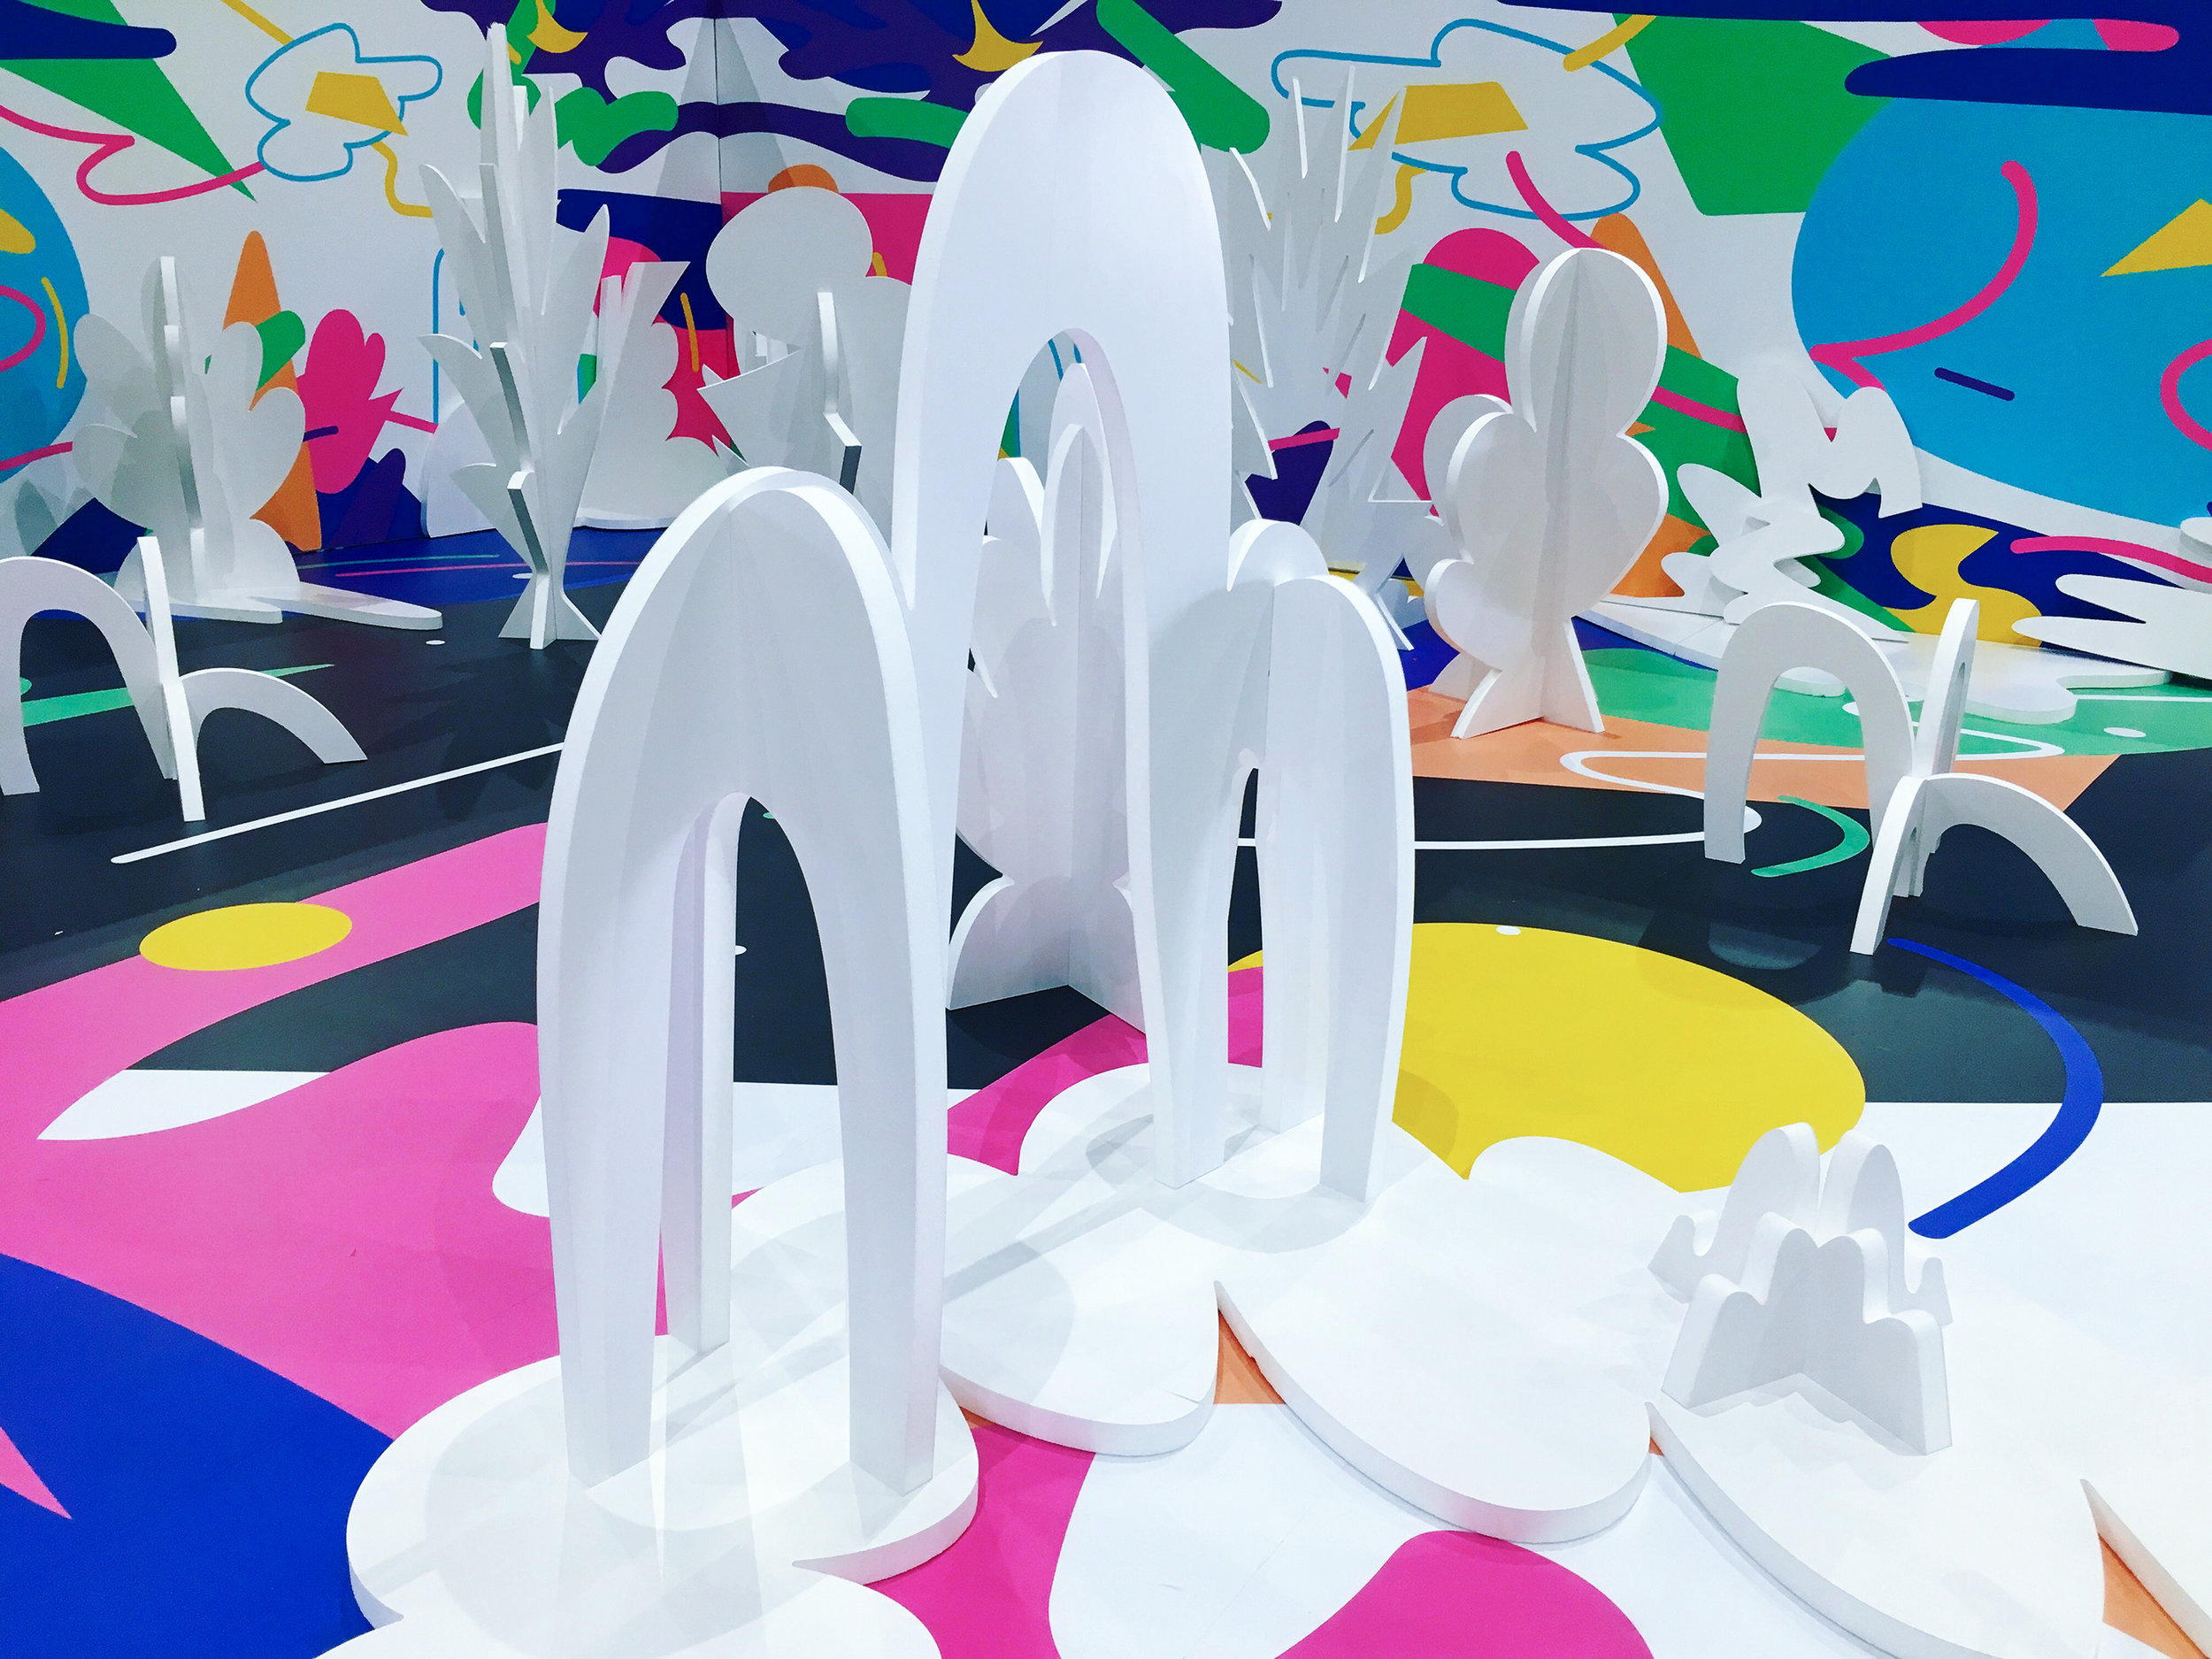 Nadine Kolodziey: The Undrawn Drawing Hollywood Garden, art installation @ Space 15 Twenty // photo source: Facebook